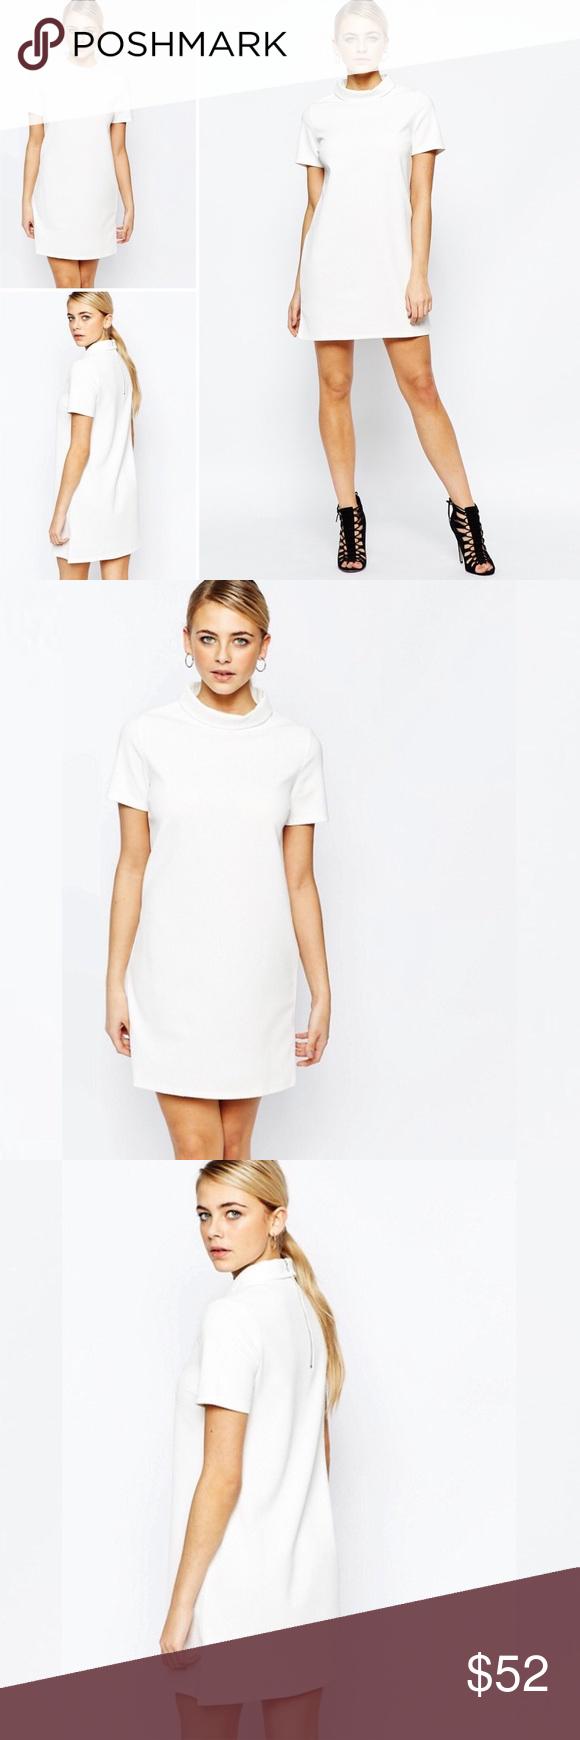 Like New Asos Textured Mock Turtleneck Dress Sz14 Fashion Turtle Neck Dress Fashion Union [ 1740 x 580 Pixel ]